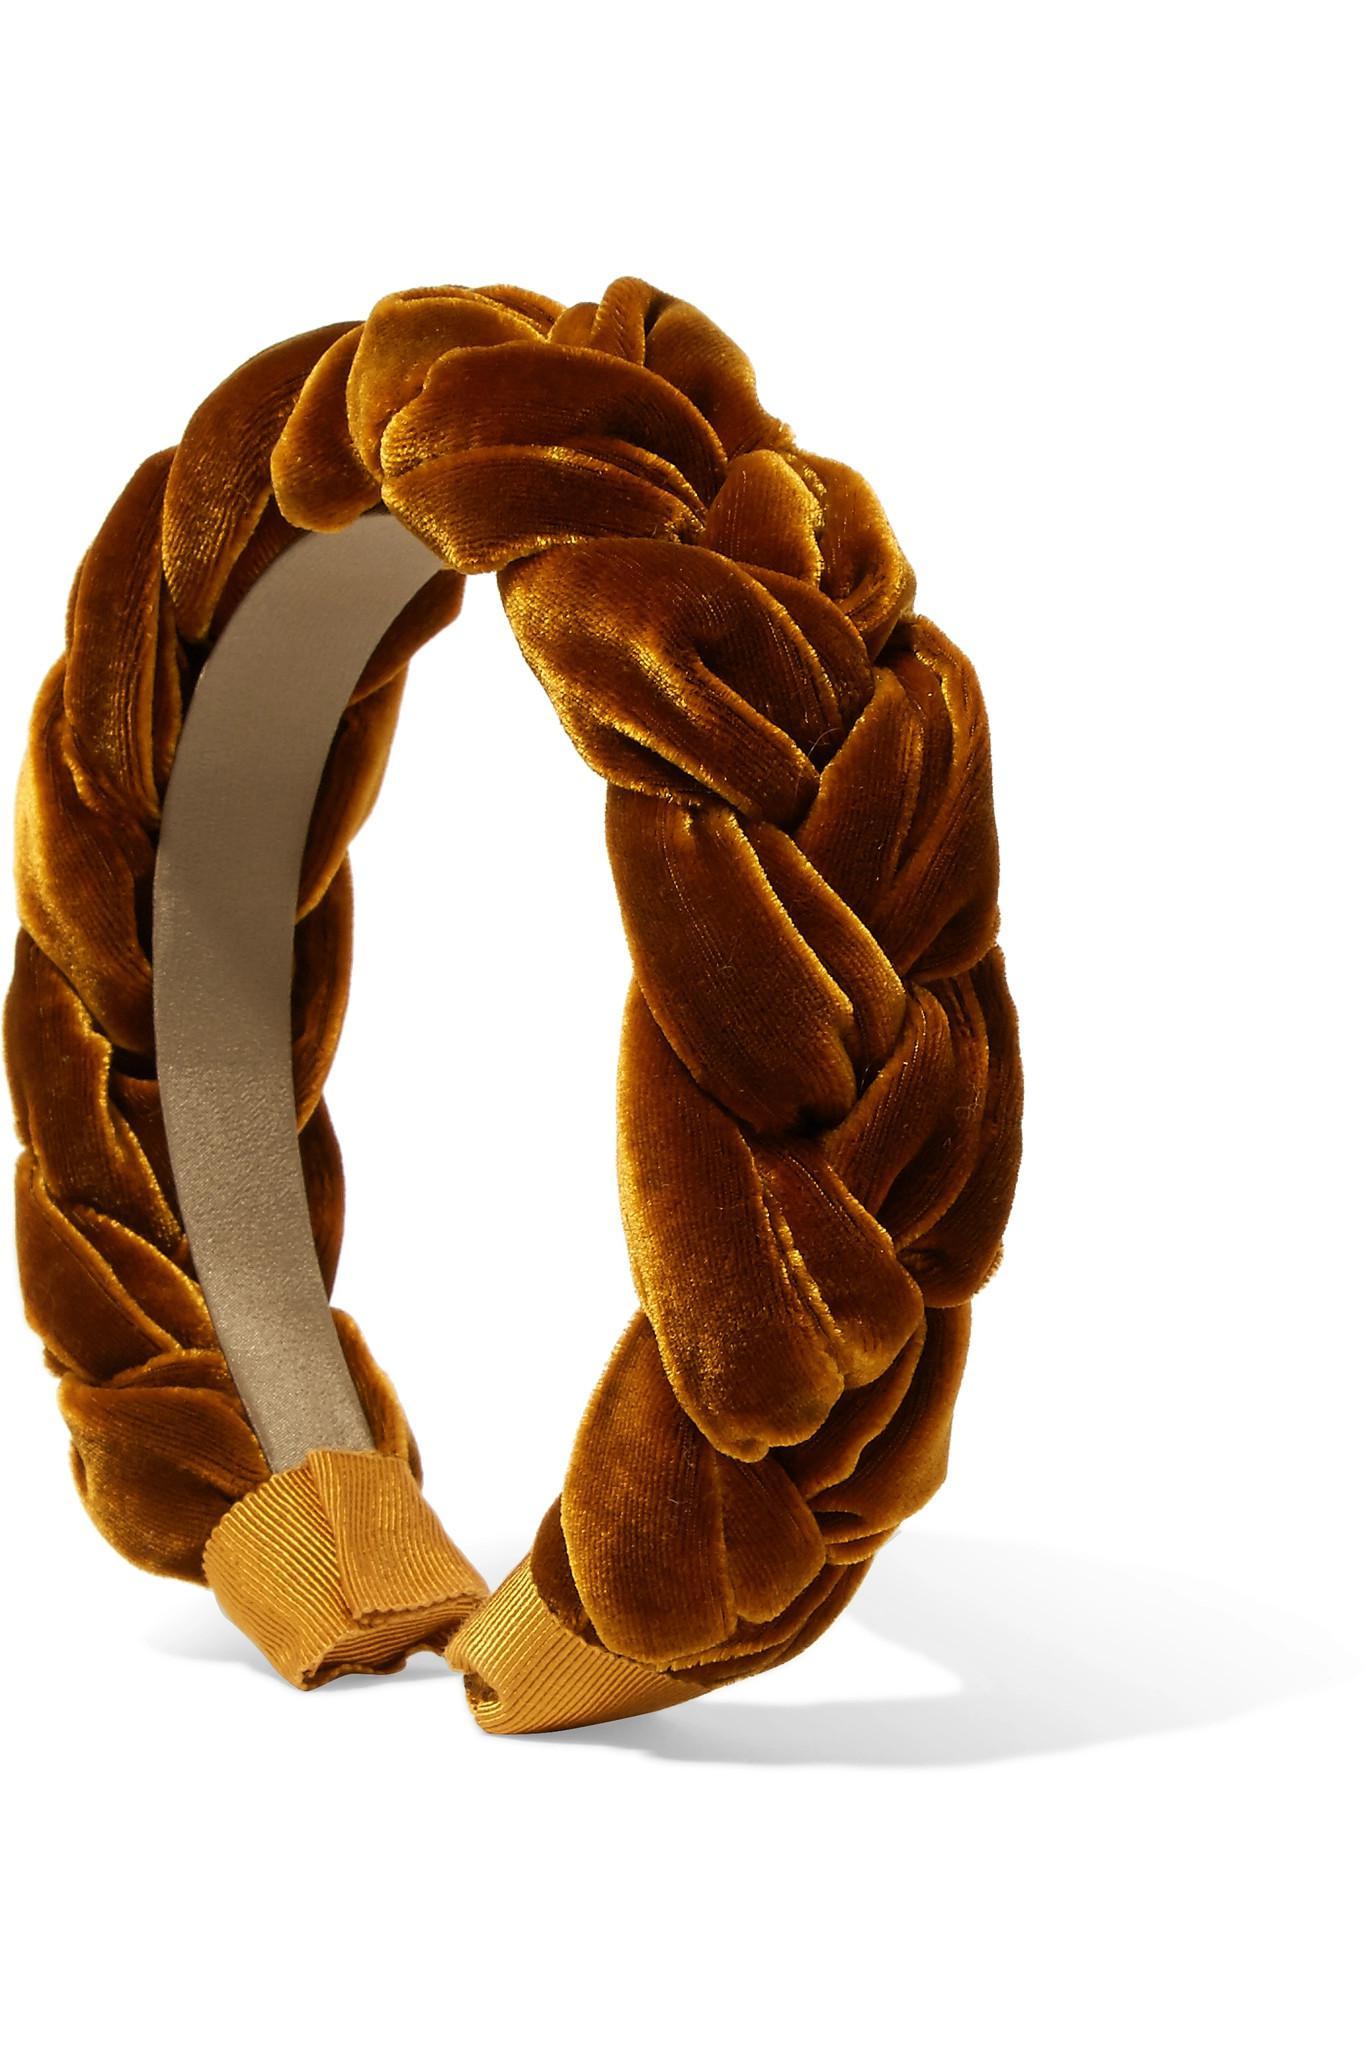 Jennifer Behr Braided Velvet Headband in Orange - Lyst 0715c665369